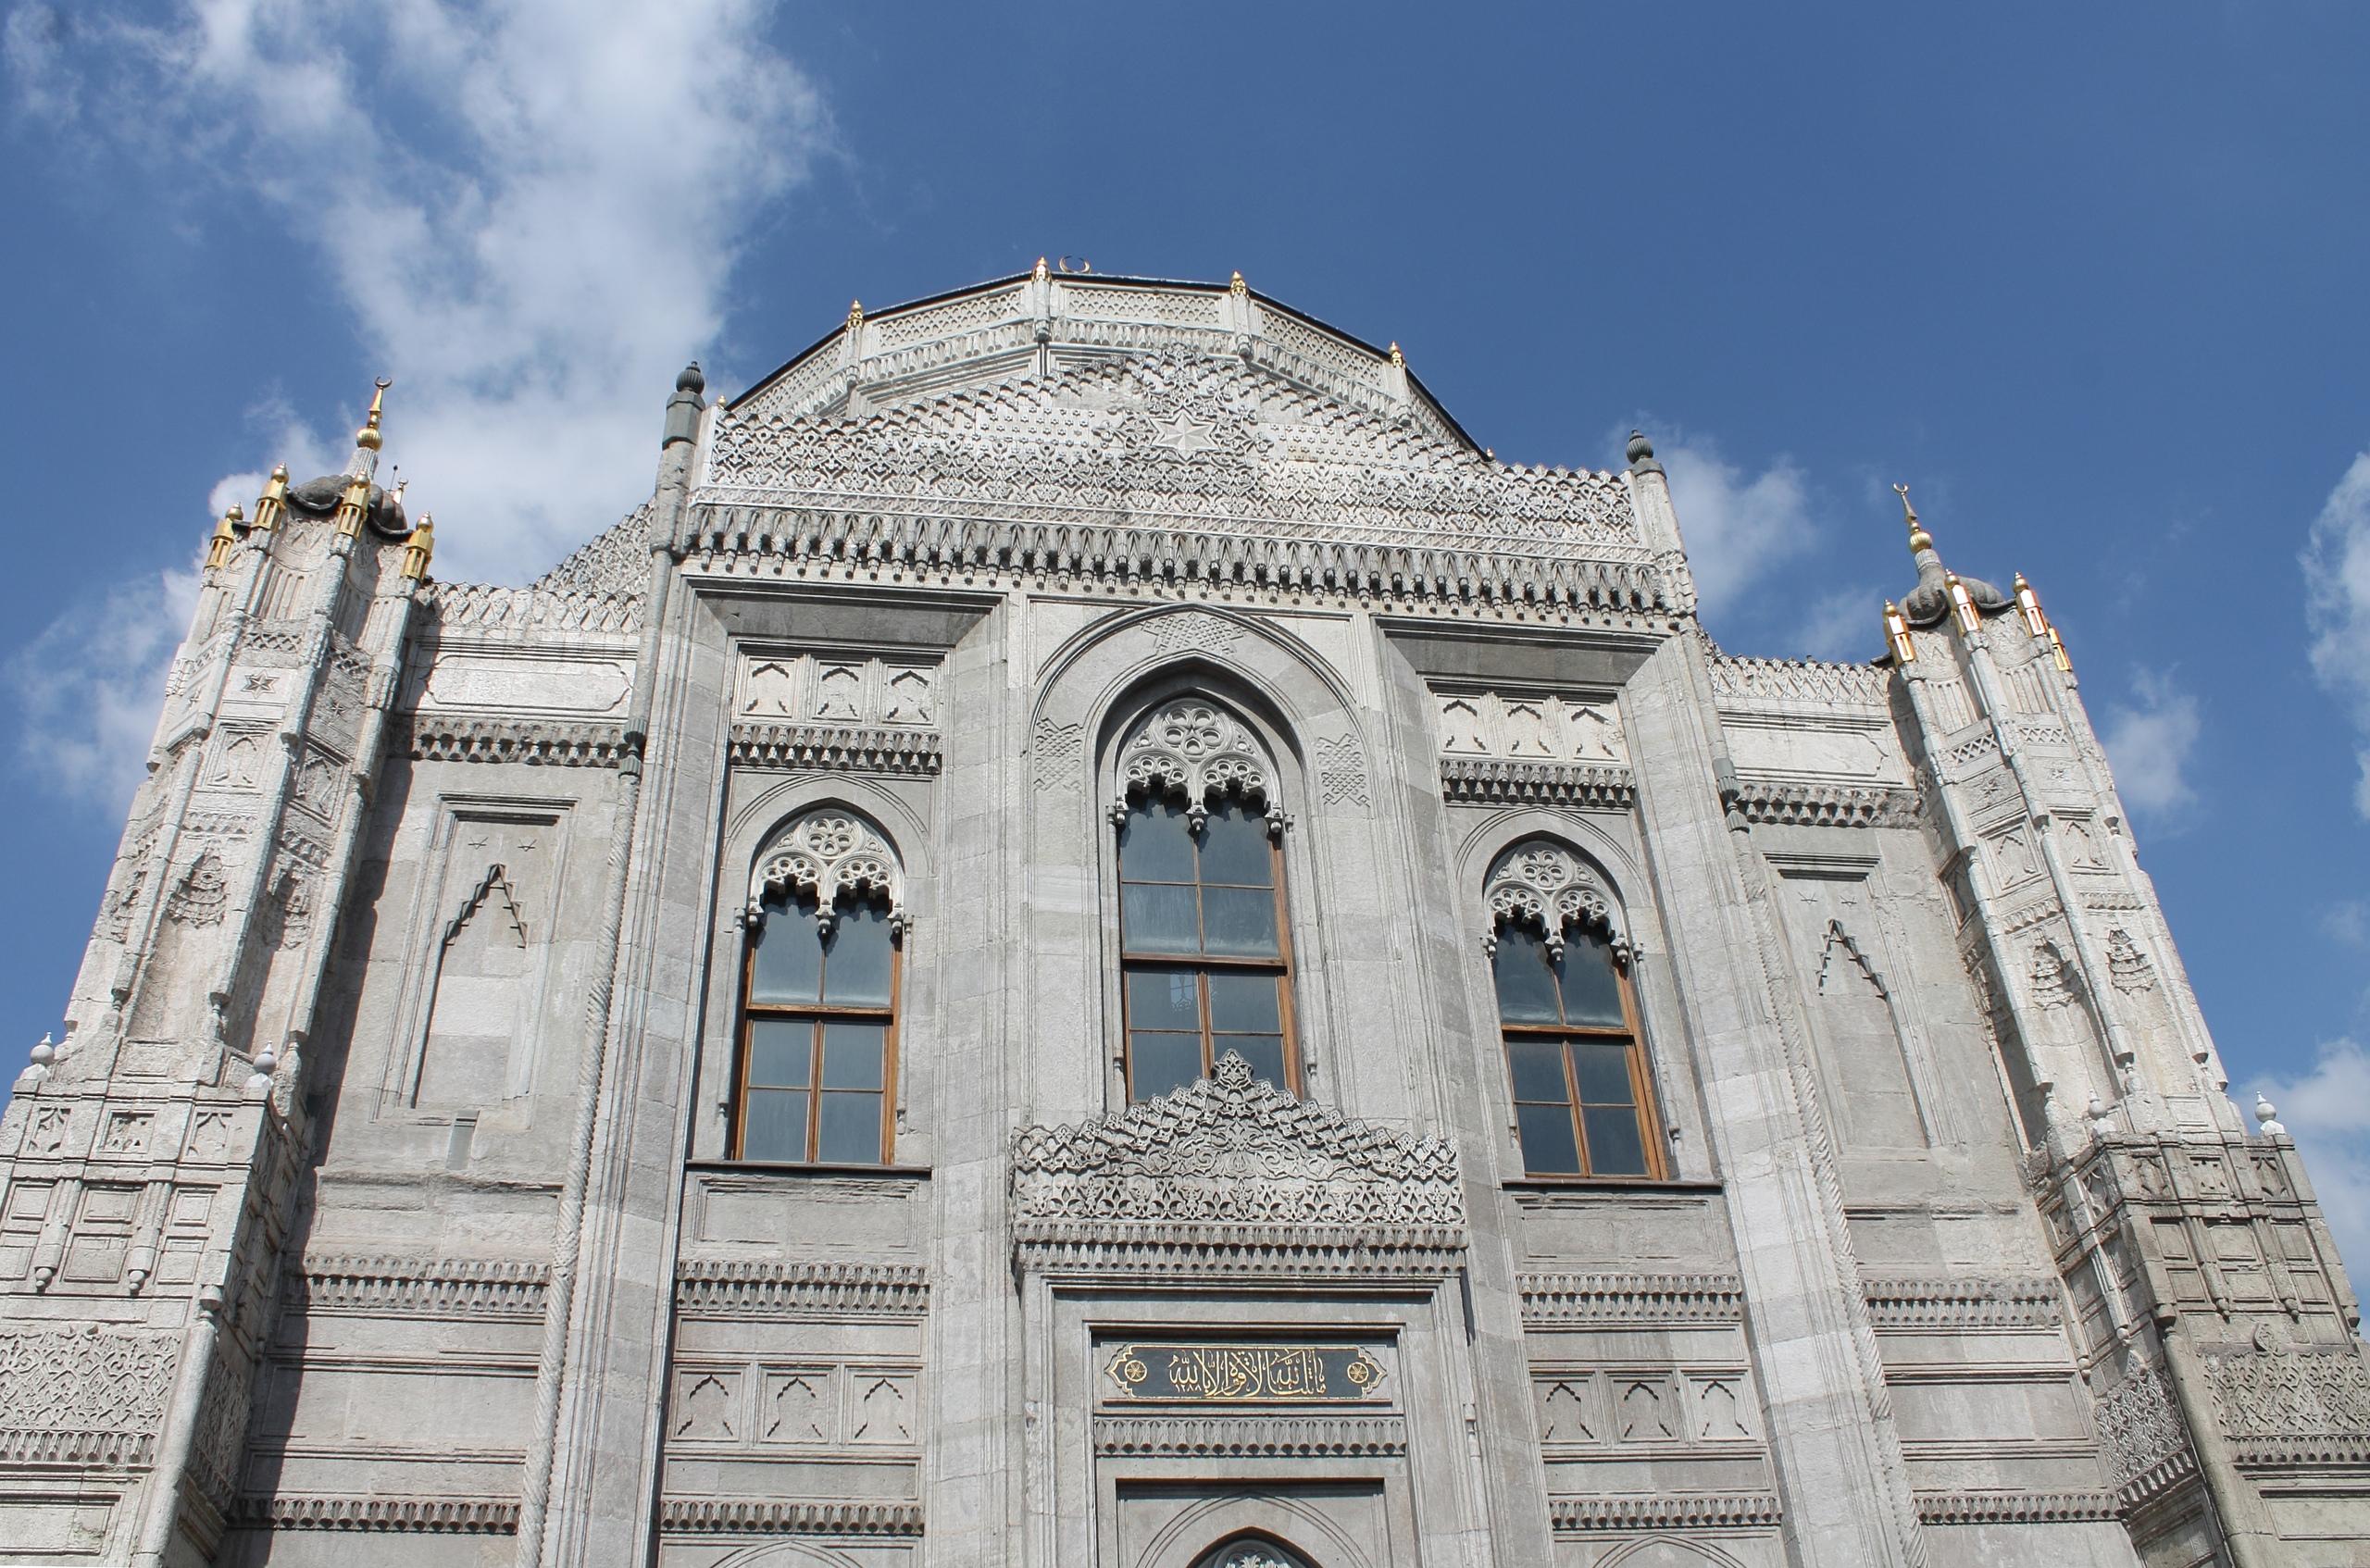 10 дней в Стамбуле. День 9 и 10. Мечети Валиде, Фатих, Шехзаде, Сулеймание, Михримах, Султанахмет